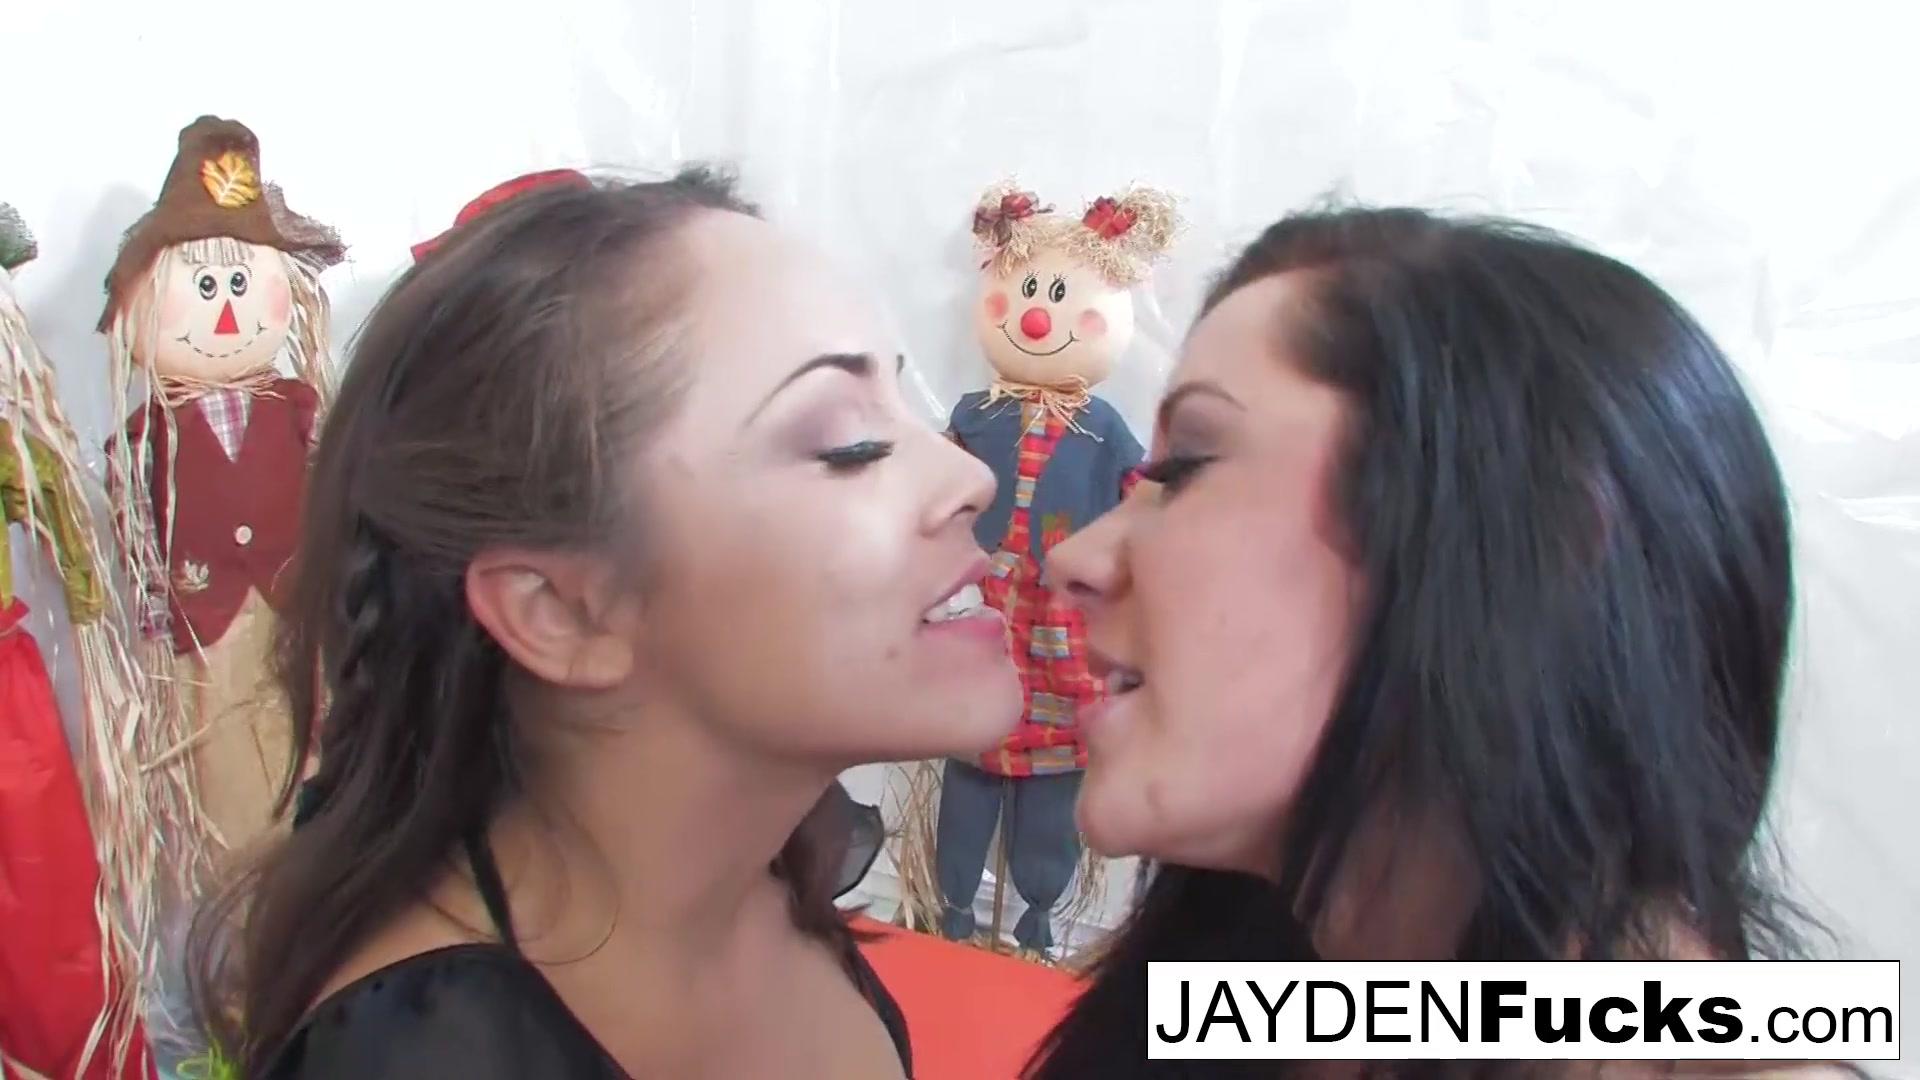 Lesbiean fuckd orgu gallerys